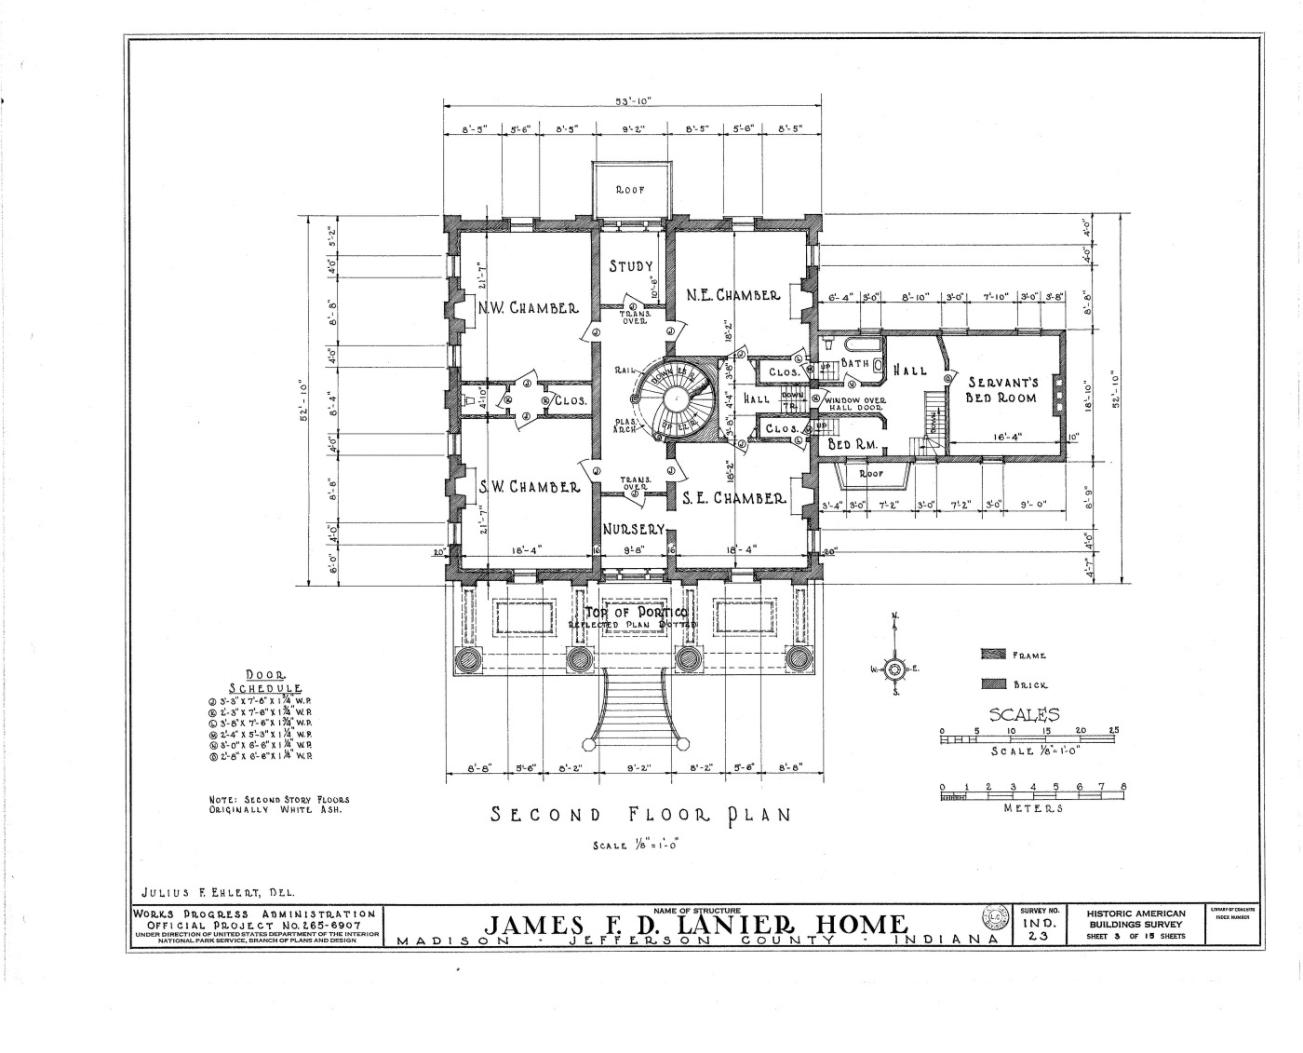 Second Floor Lanier Mansion Madison Indiana Greek Revival Greek Revival Architecture Vintage House Plans